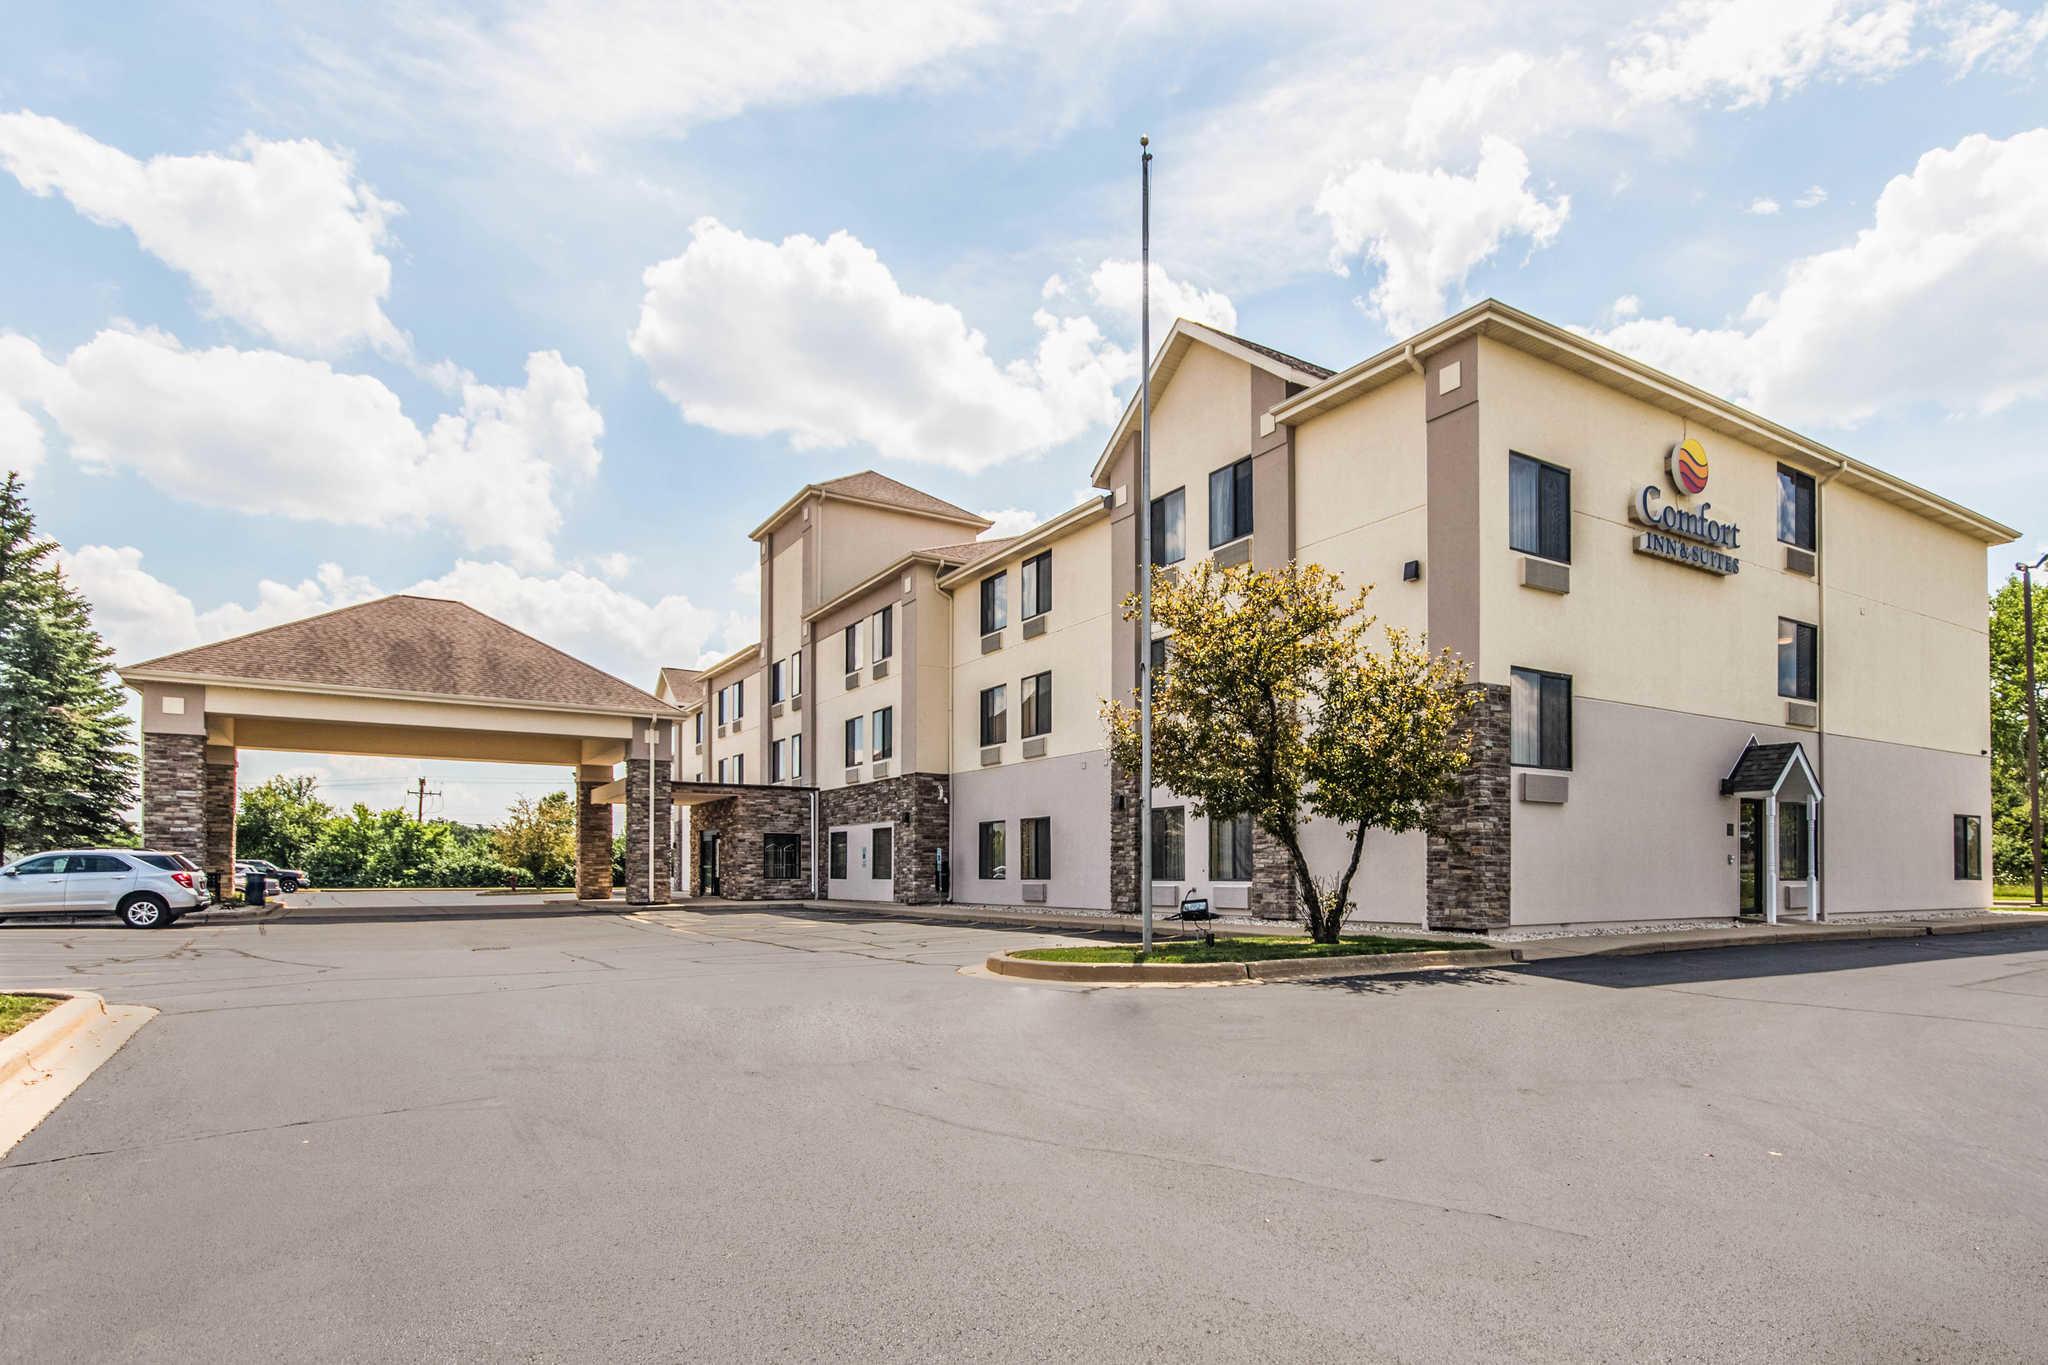 Comfort Inn & Suites North Aurora - Naperville image 2